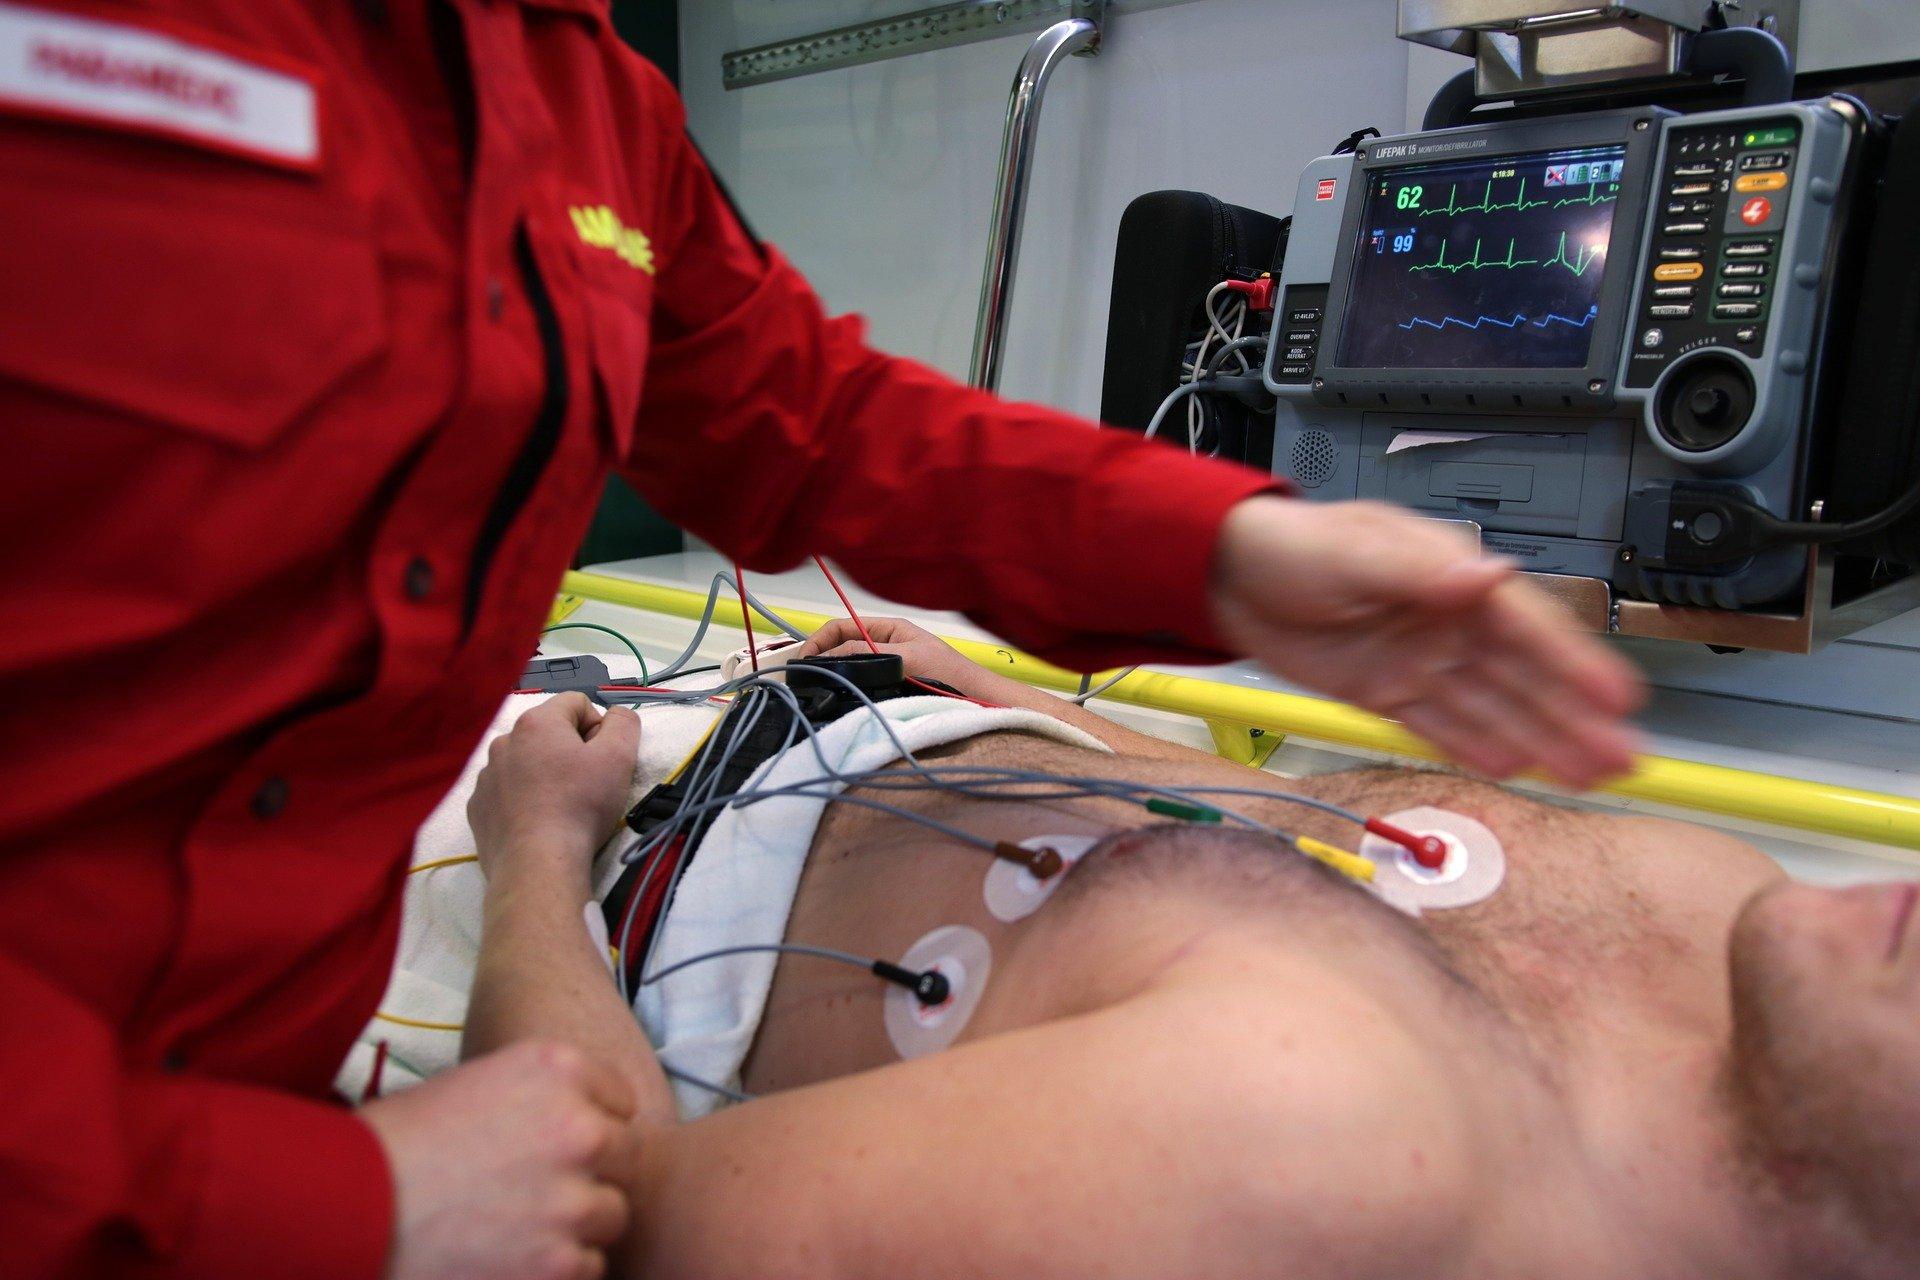 A paramedic helping a patient | Source: Pixabay.com